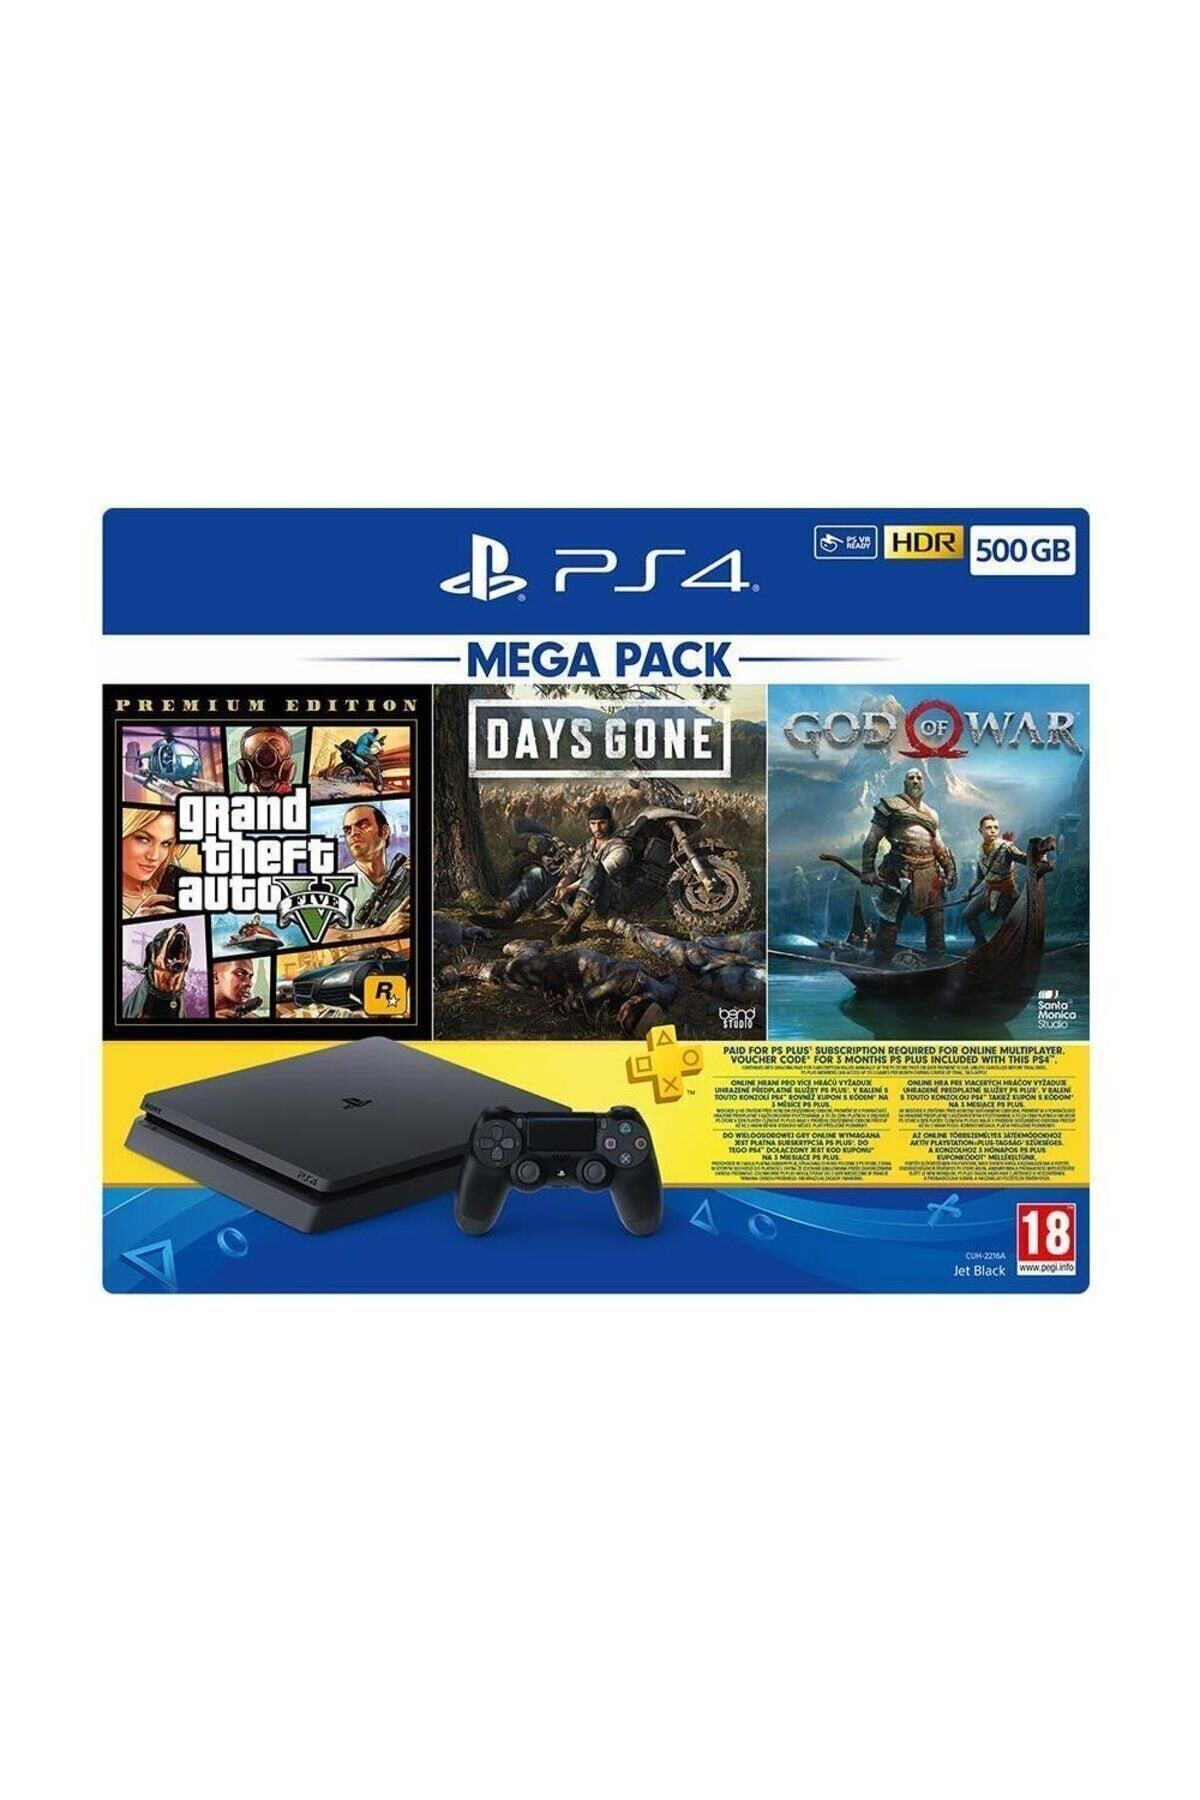 Sony Playstation 4 Slim 500 Gb + Gta V + Days Gone + God Of War + Psn (eurasia Garantili) 1